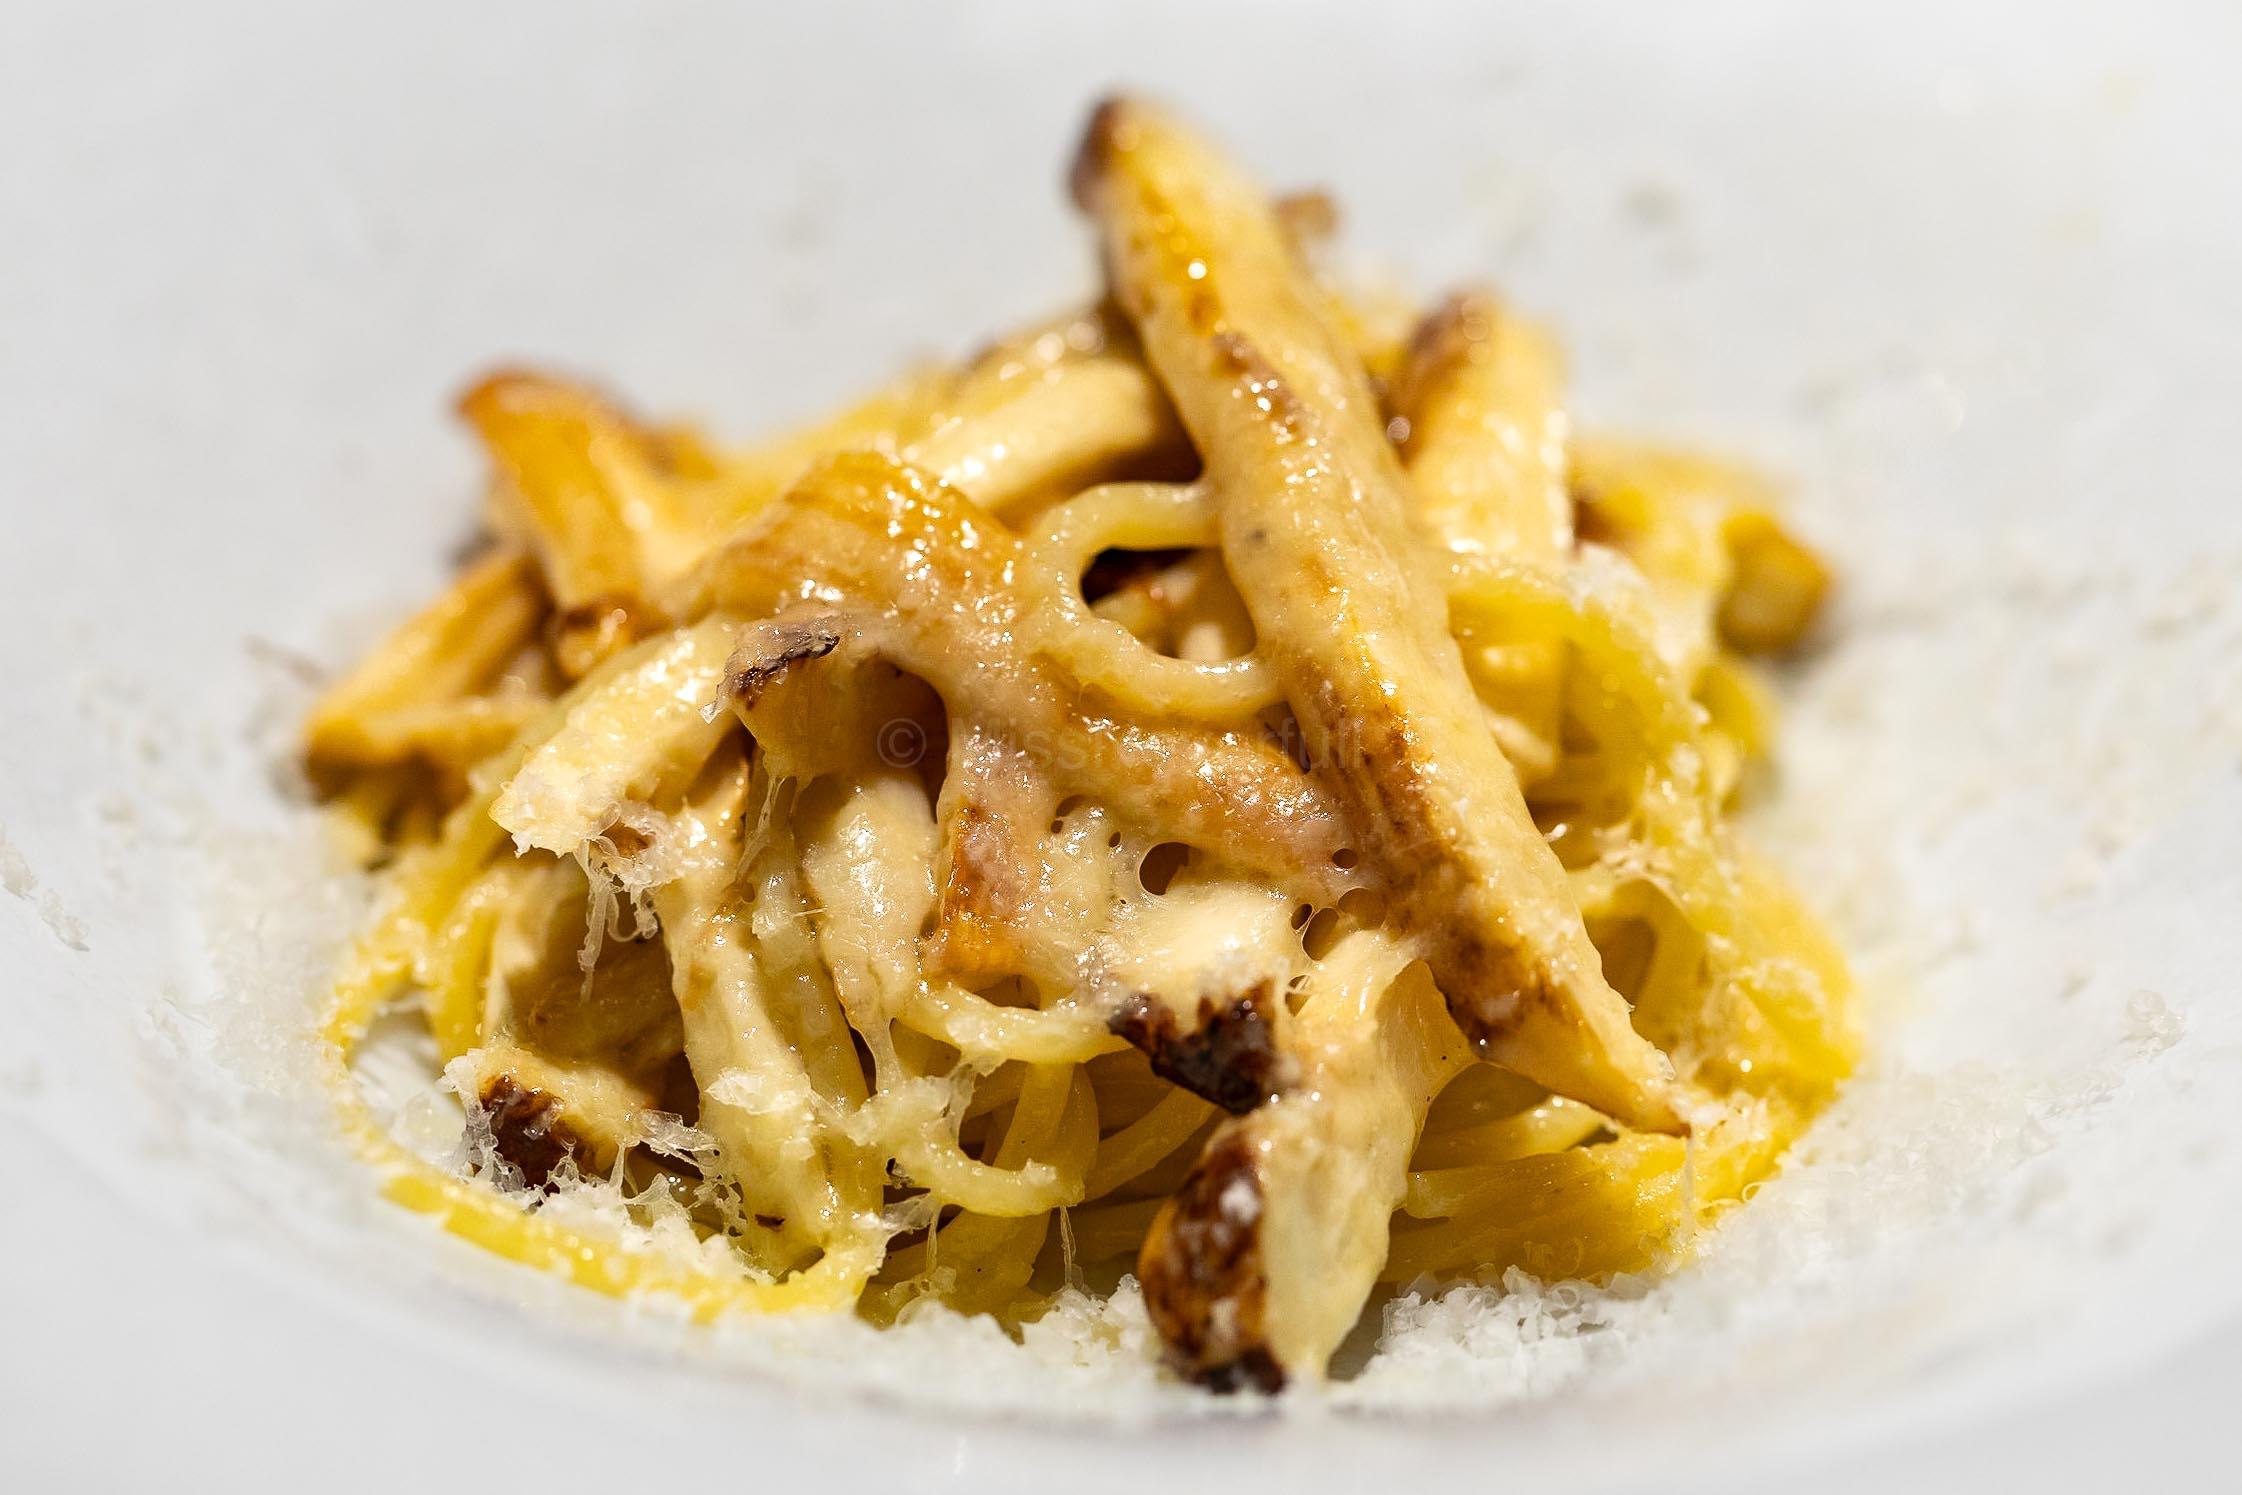 4. Spaghetti with Matsutake